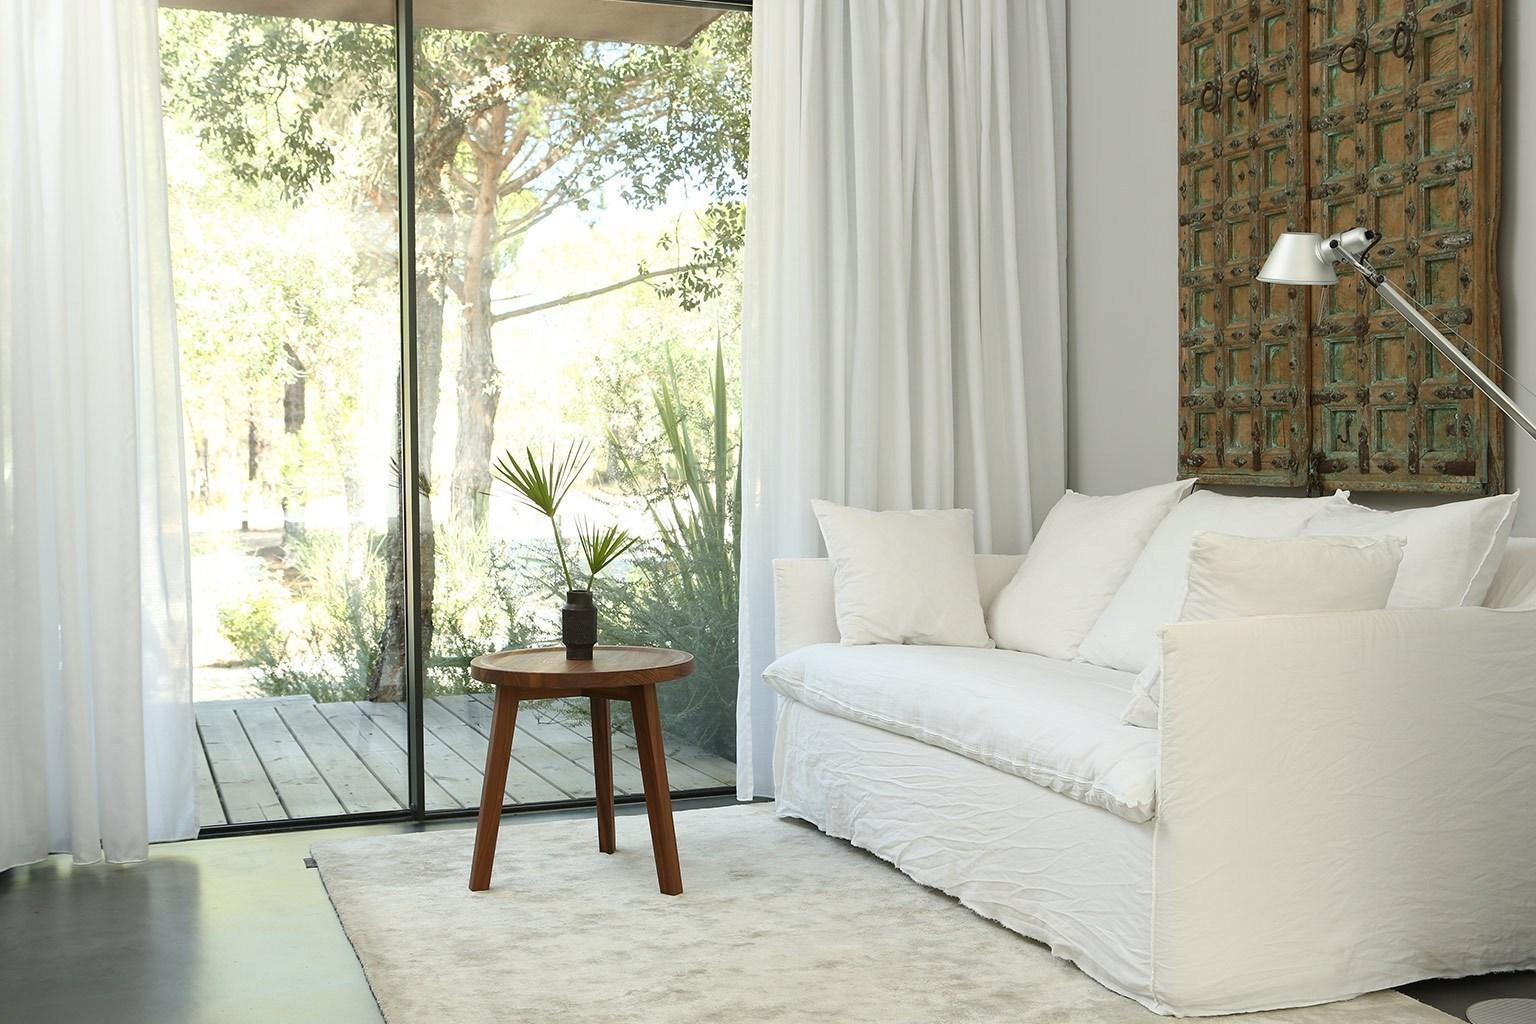 Luxushotel sublime comporta in portugal designreisen for Comport room design